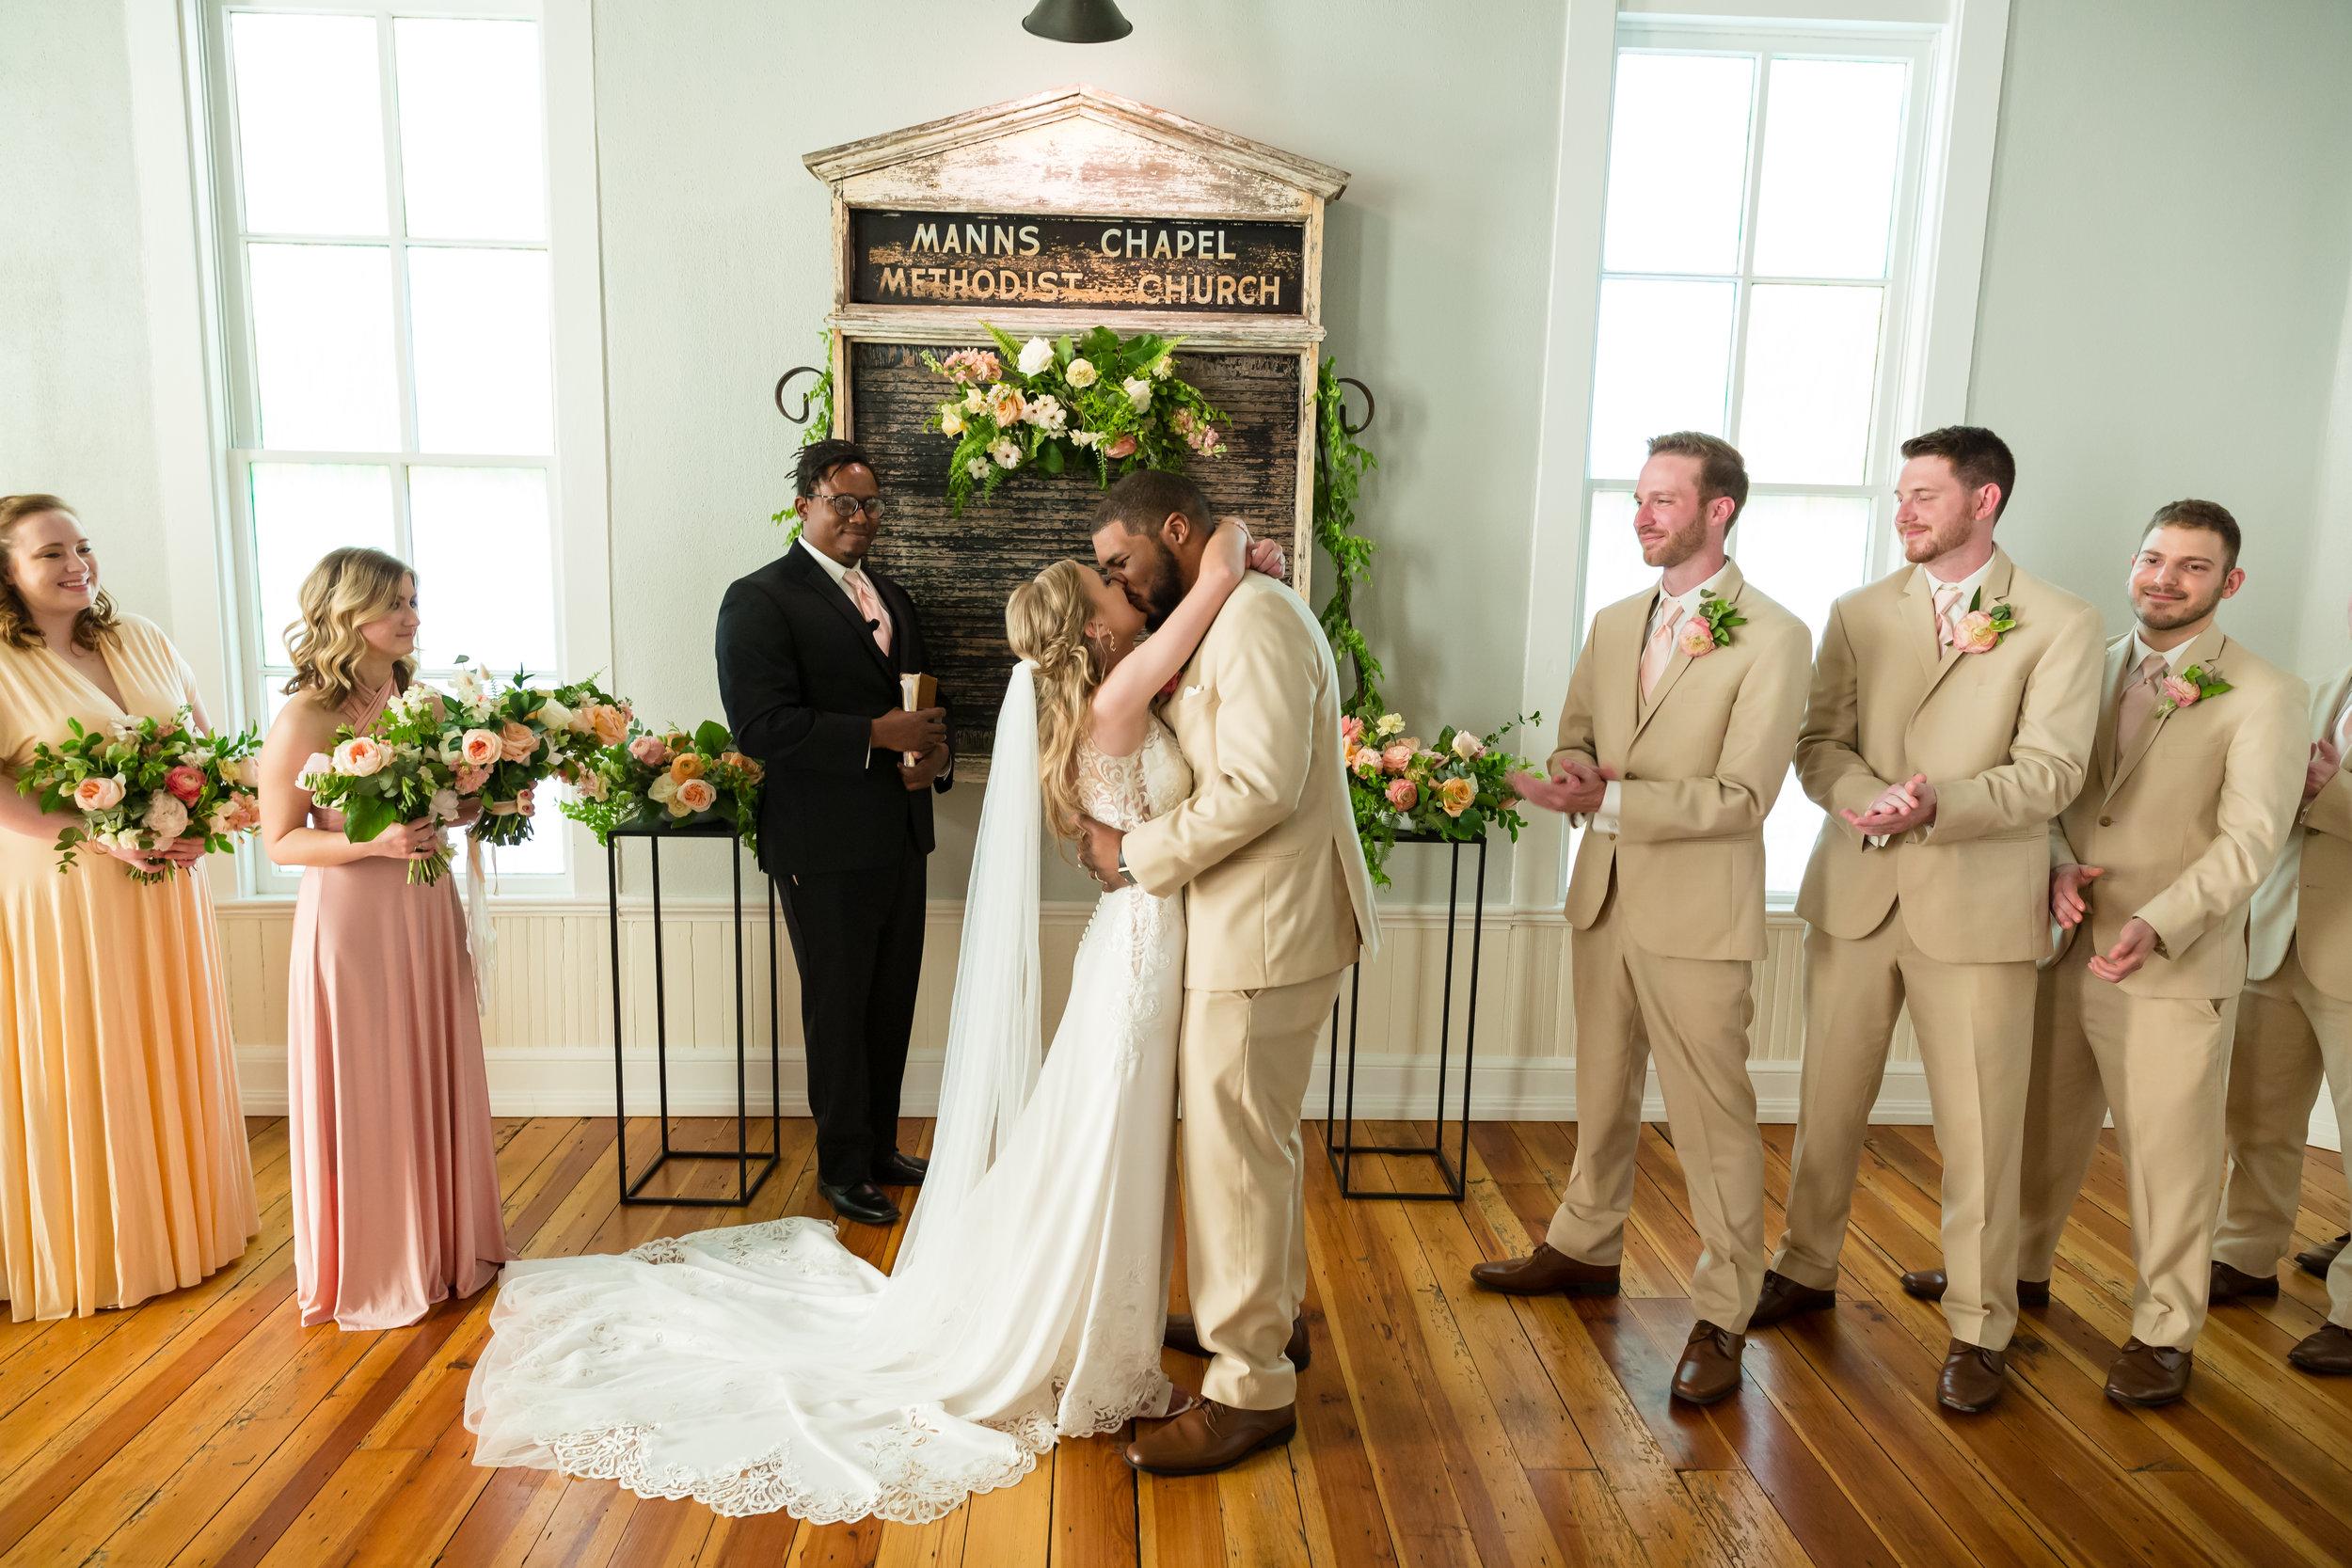 sarah_ikeem_wedding_at_the_parlour_at_manns_chapel_05.18.19-0992.jpg